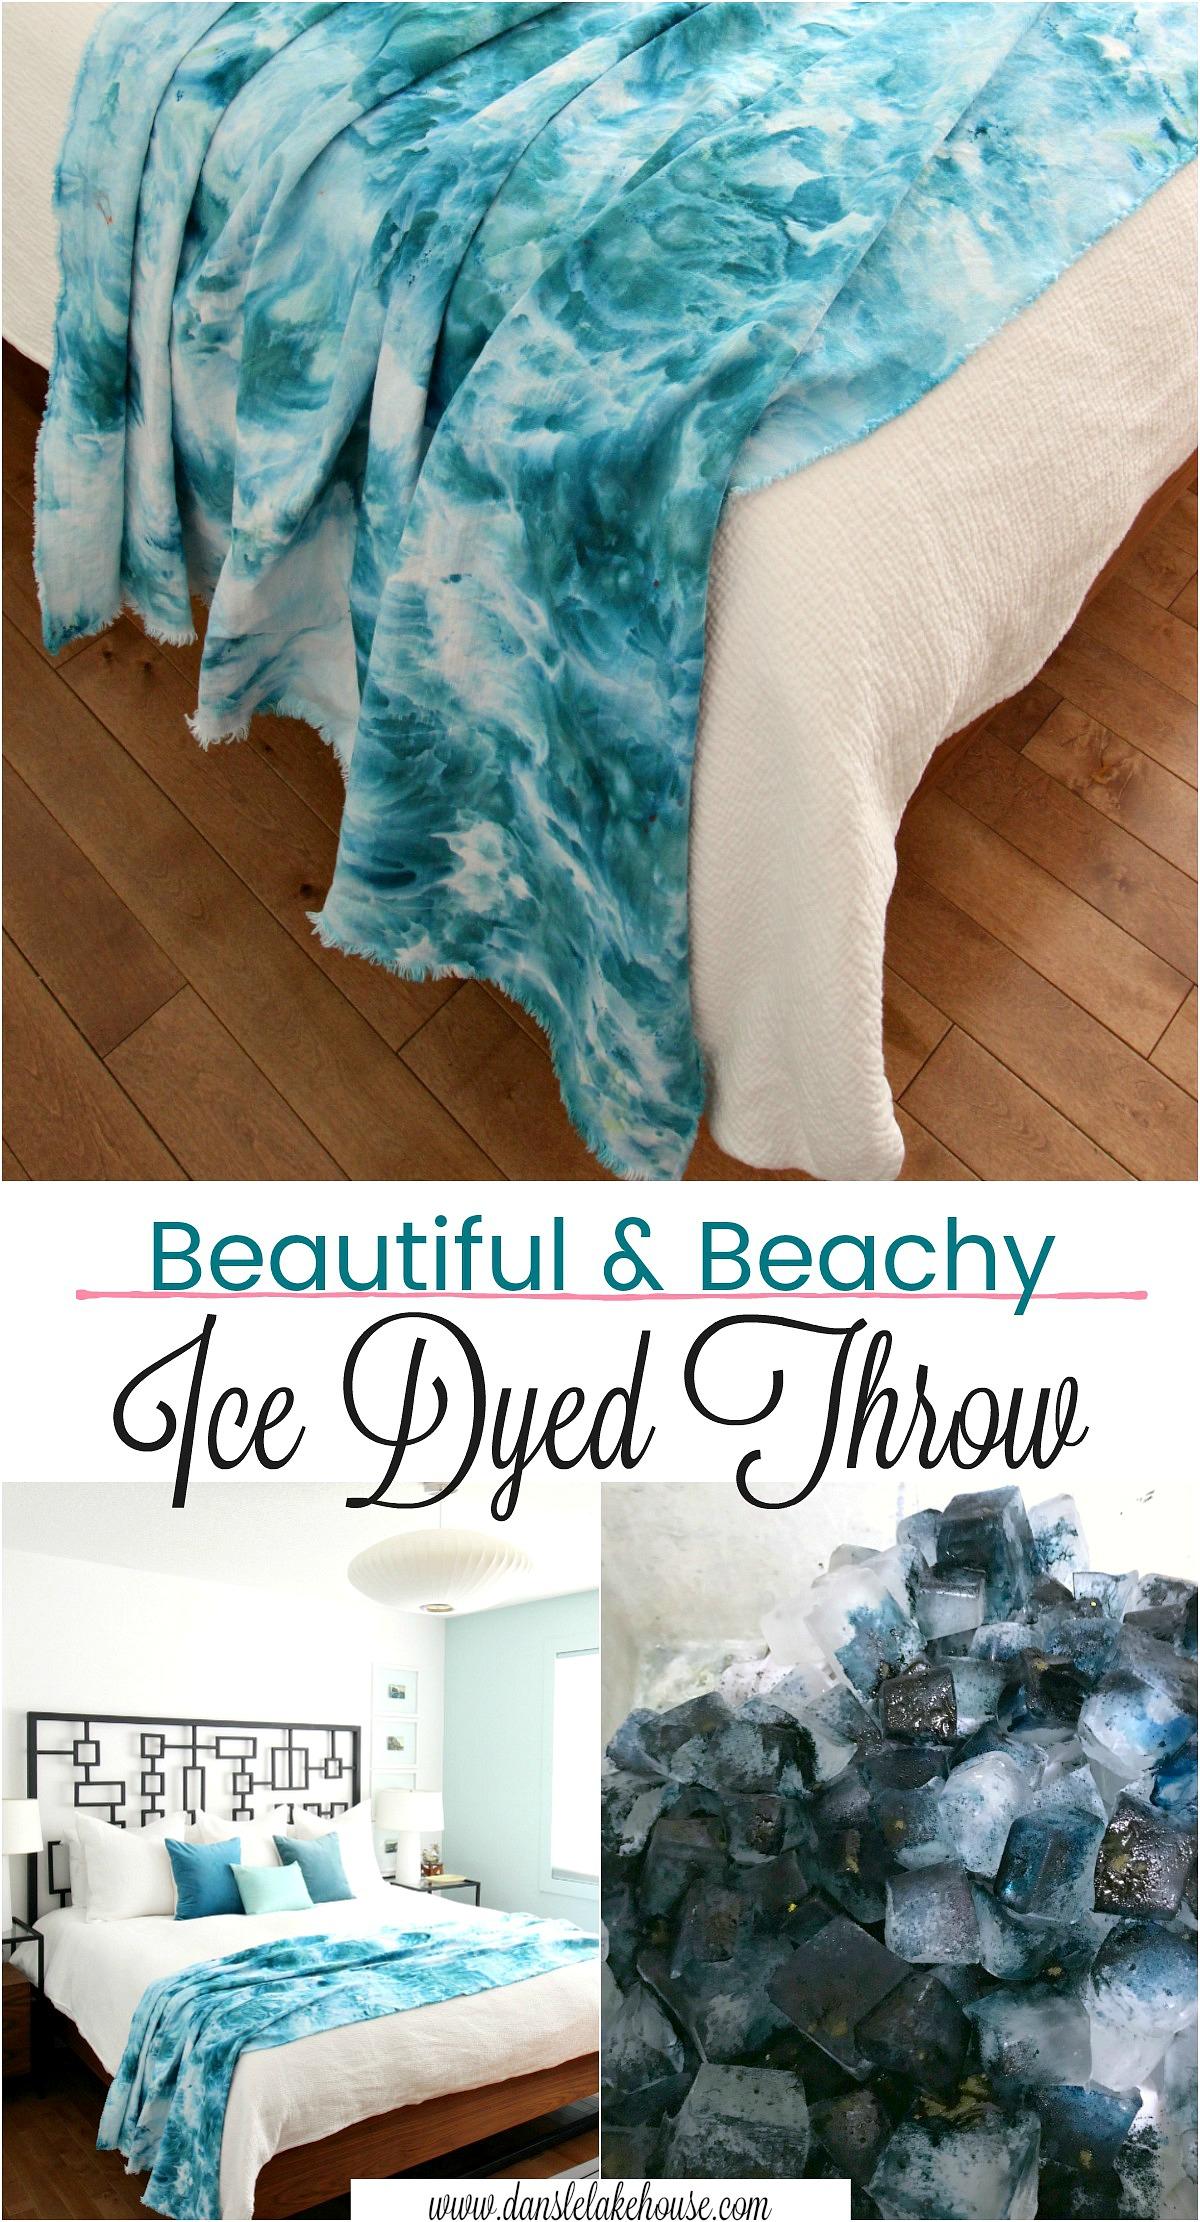 DIY Ice Dye Throw Blanket | How to Ice Dye